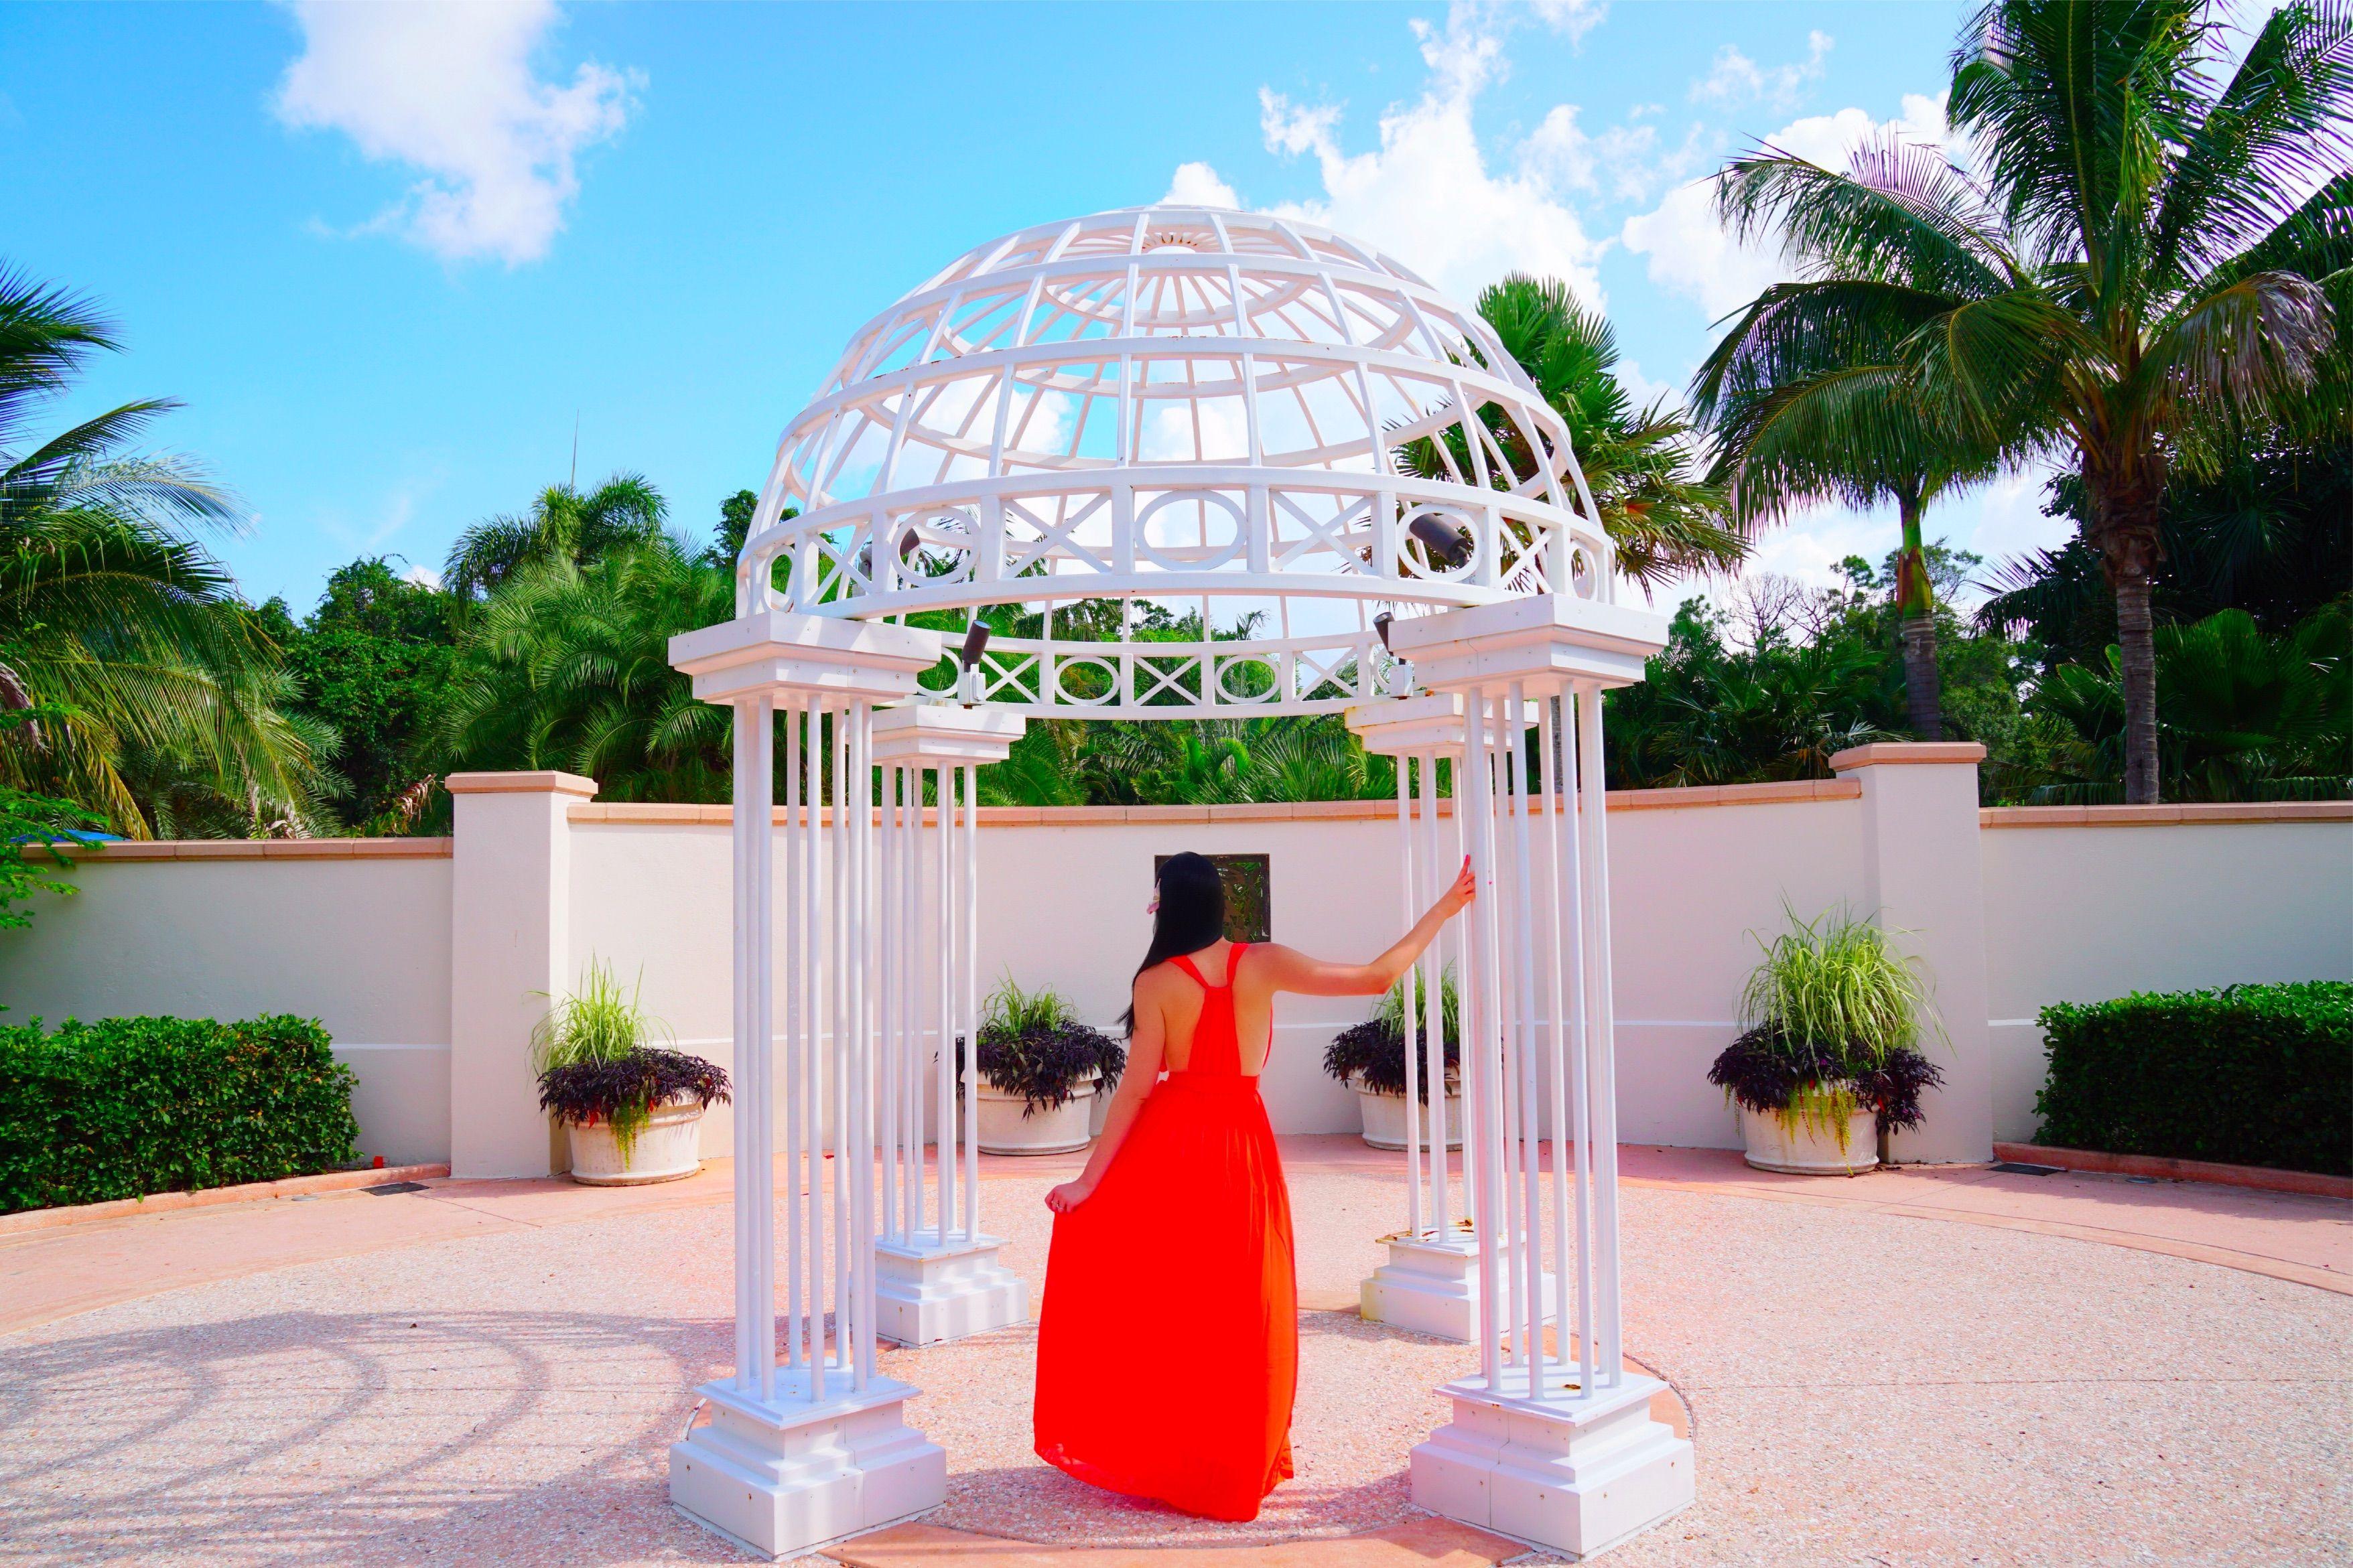 a71fdd57aaef3a6c00216dcc20668fd6 - The Florida Botanical Gardens In Largo